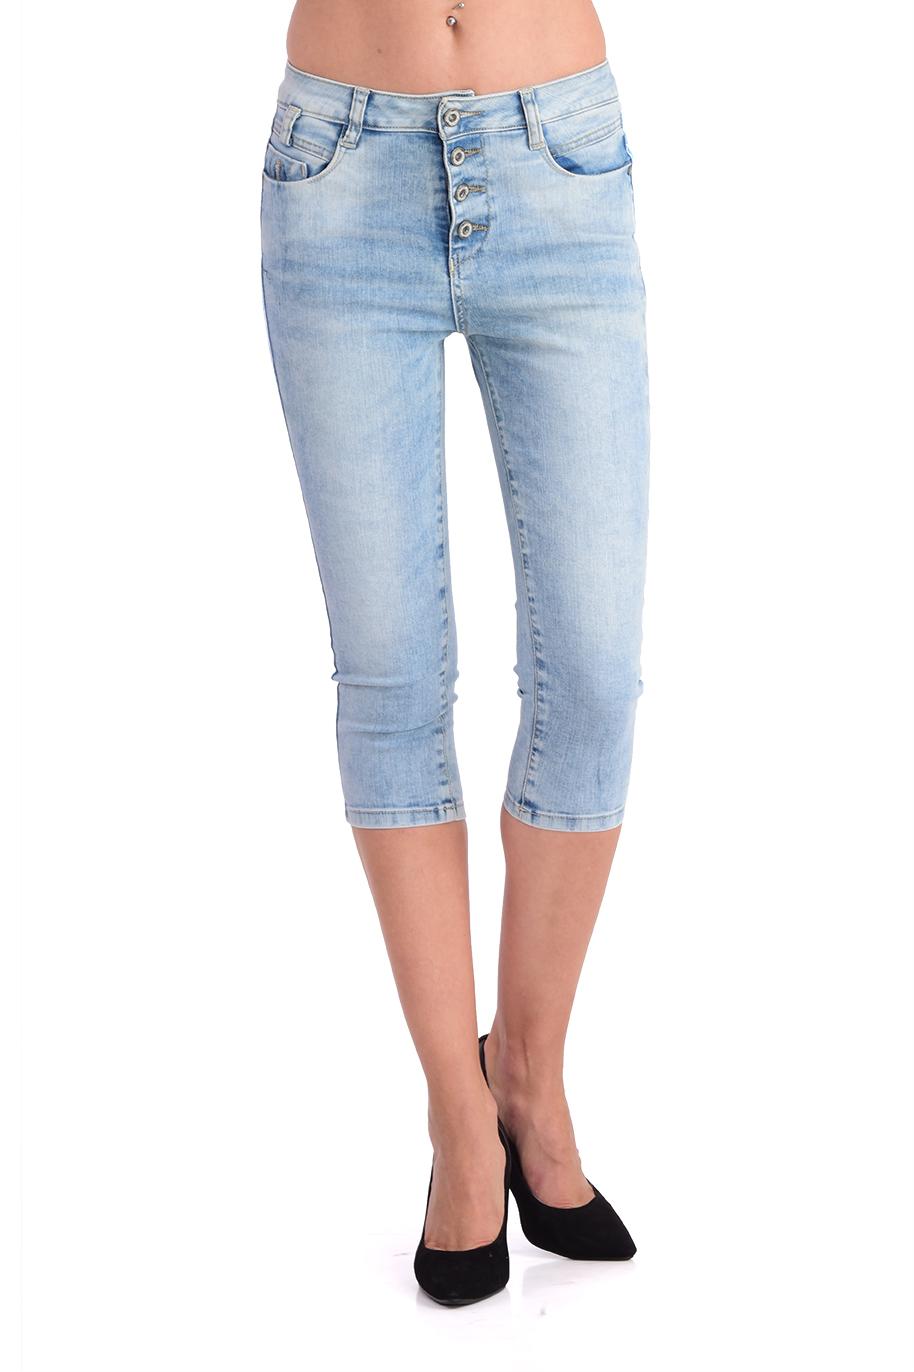 ג'ינס עינבל בהיר